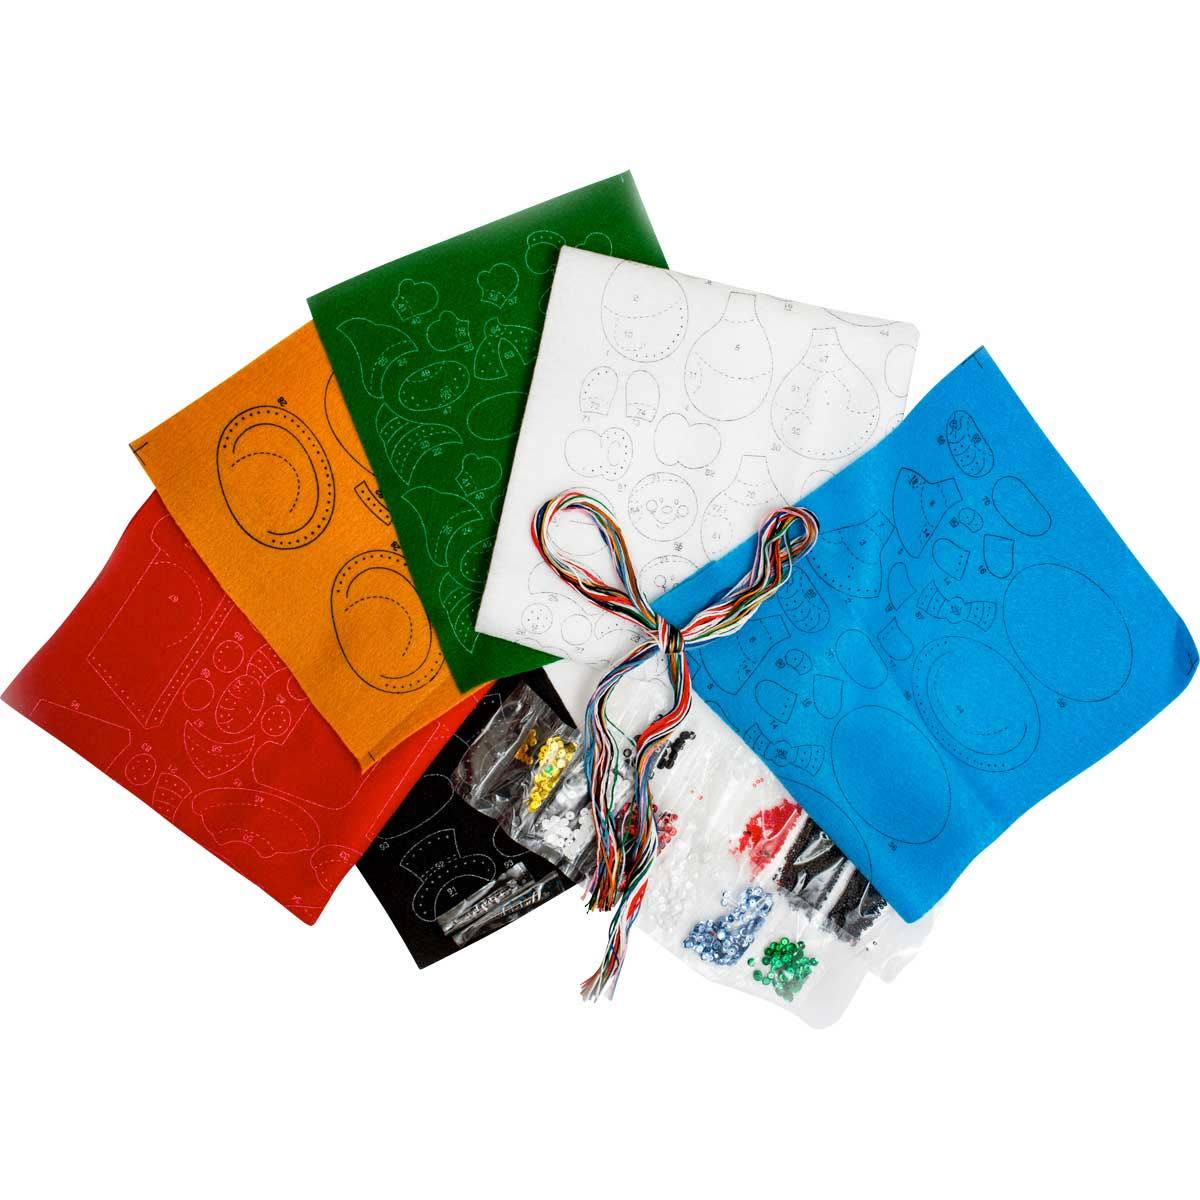 Bucilla ® Seasonal - Felt - Ornament Kits - Snow Day Fun Day